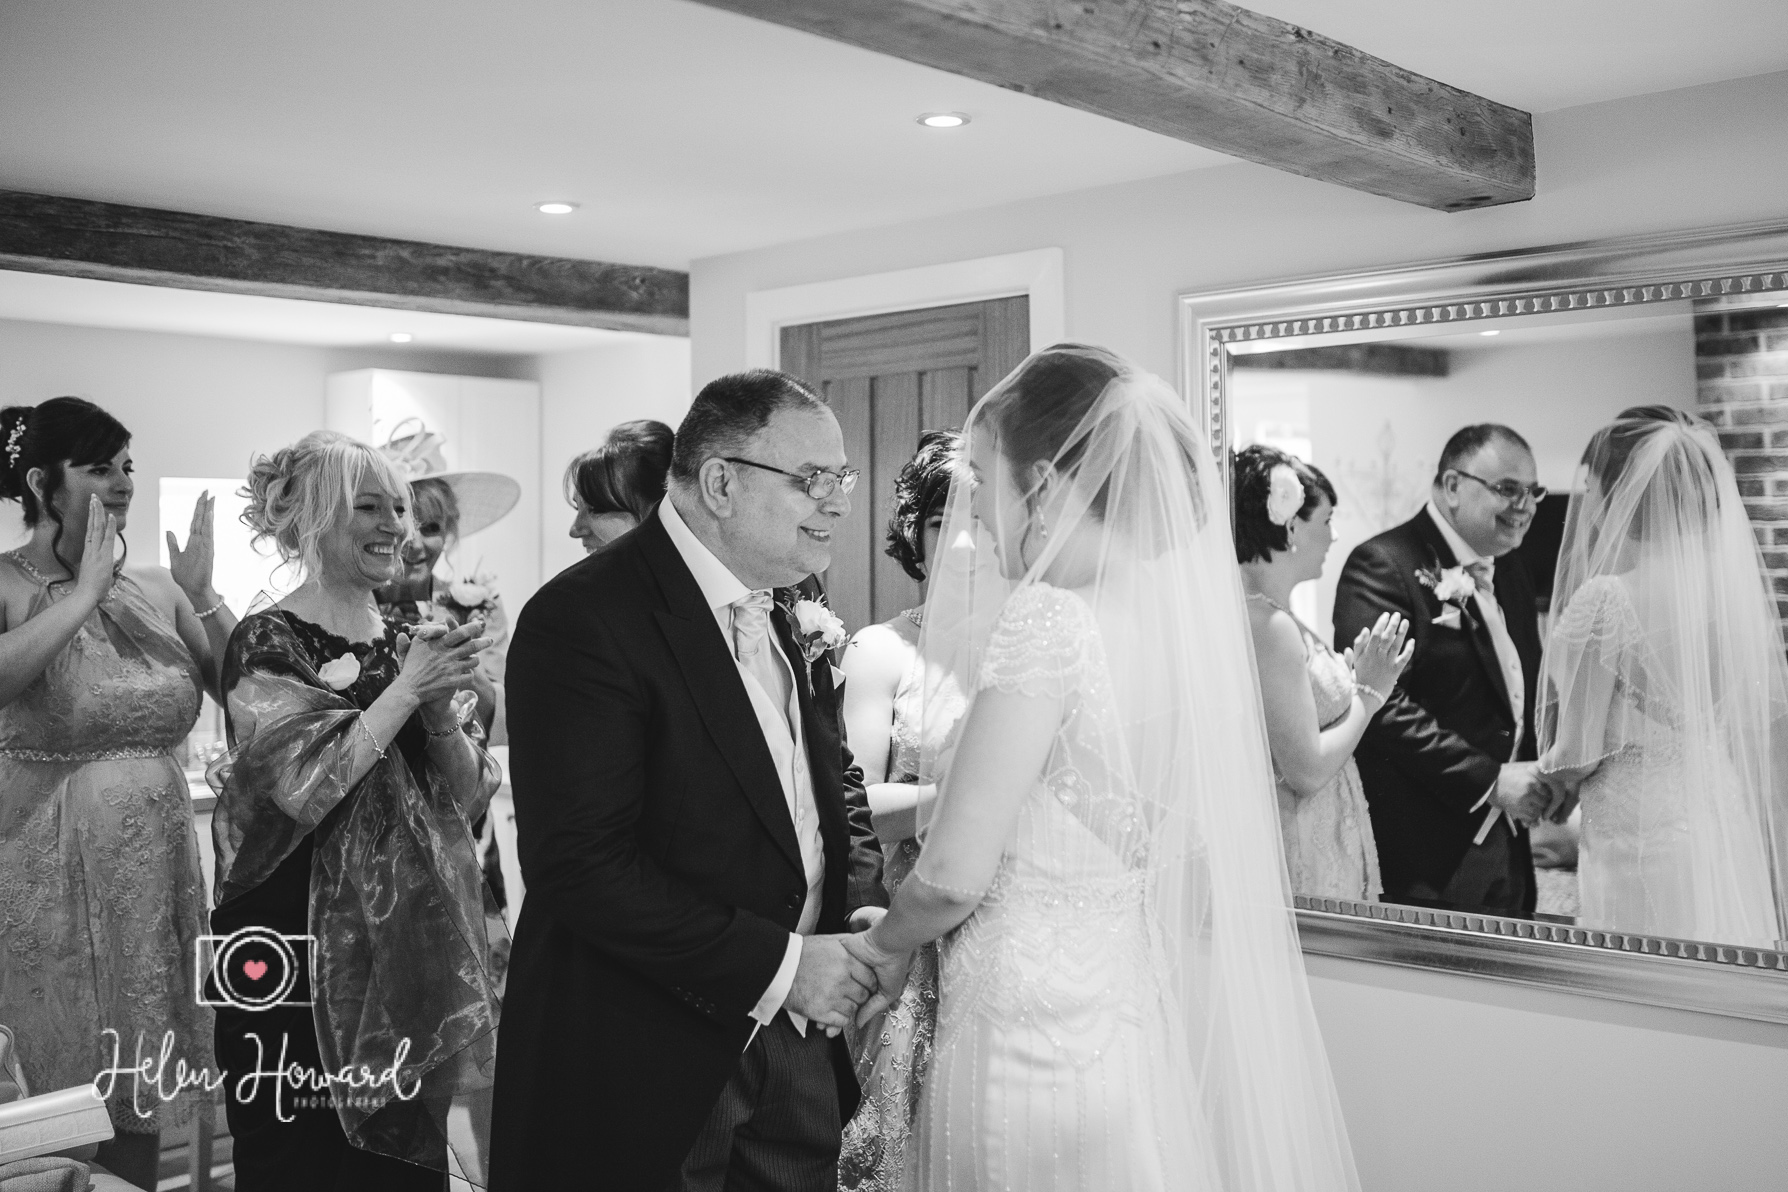 Helen Howard Photography Packington Moor Wedding-52.jpg